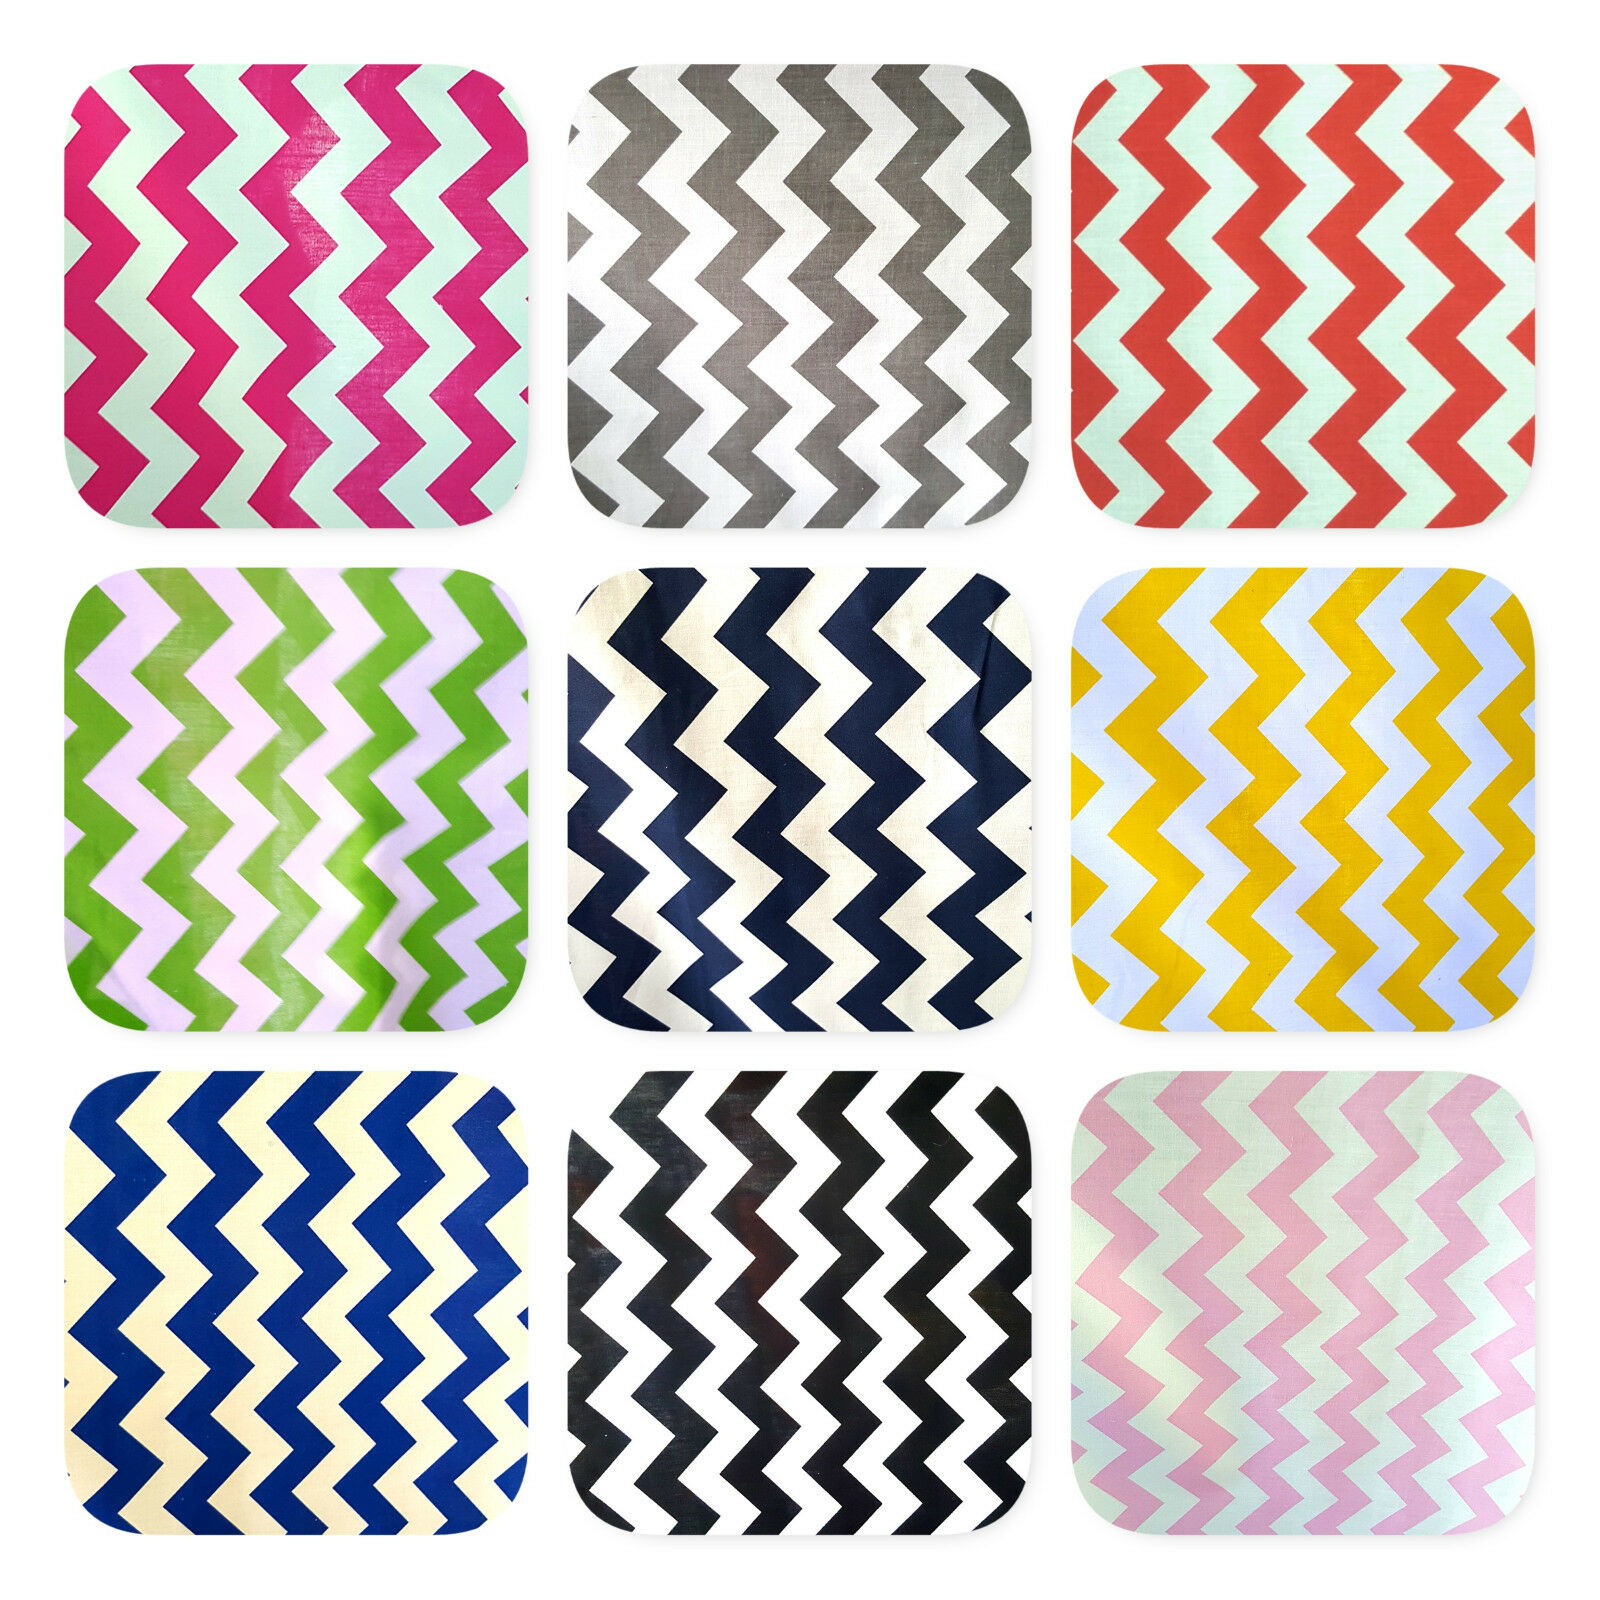 White Polycotton Fabric with Zig Zag Chevron Print Per Metre 4 Colours